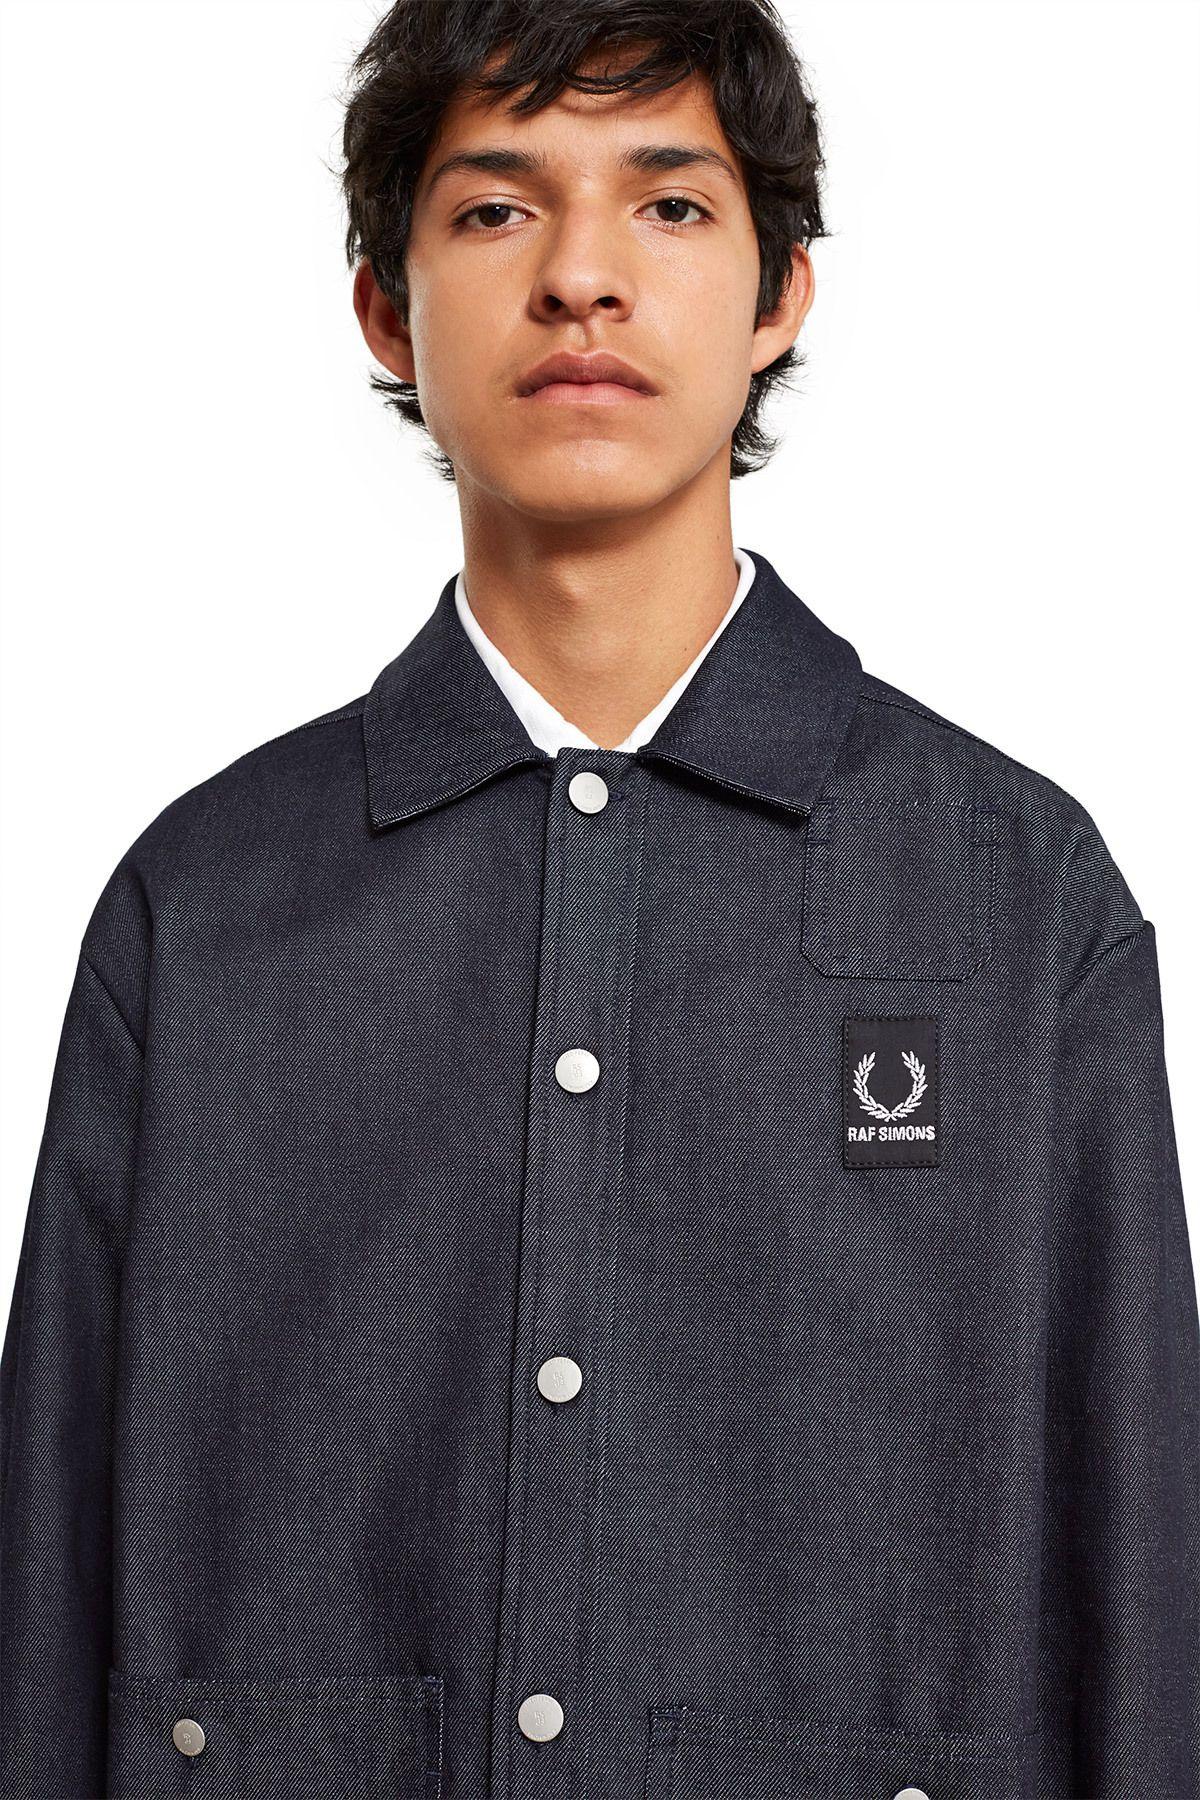 609609b10 Raf Simons × Fred Perry | Denim Shirt Jacket | Opening Ceremony ...